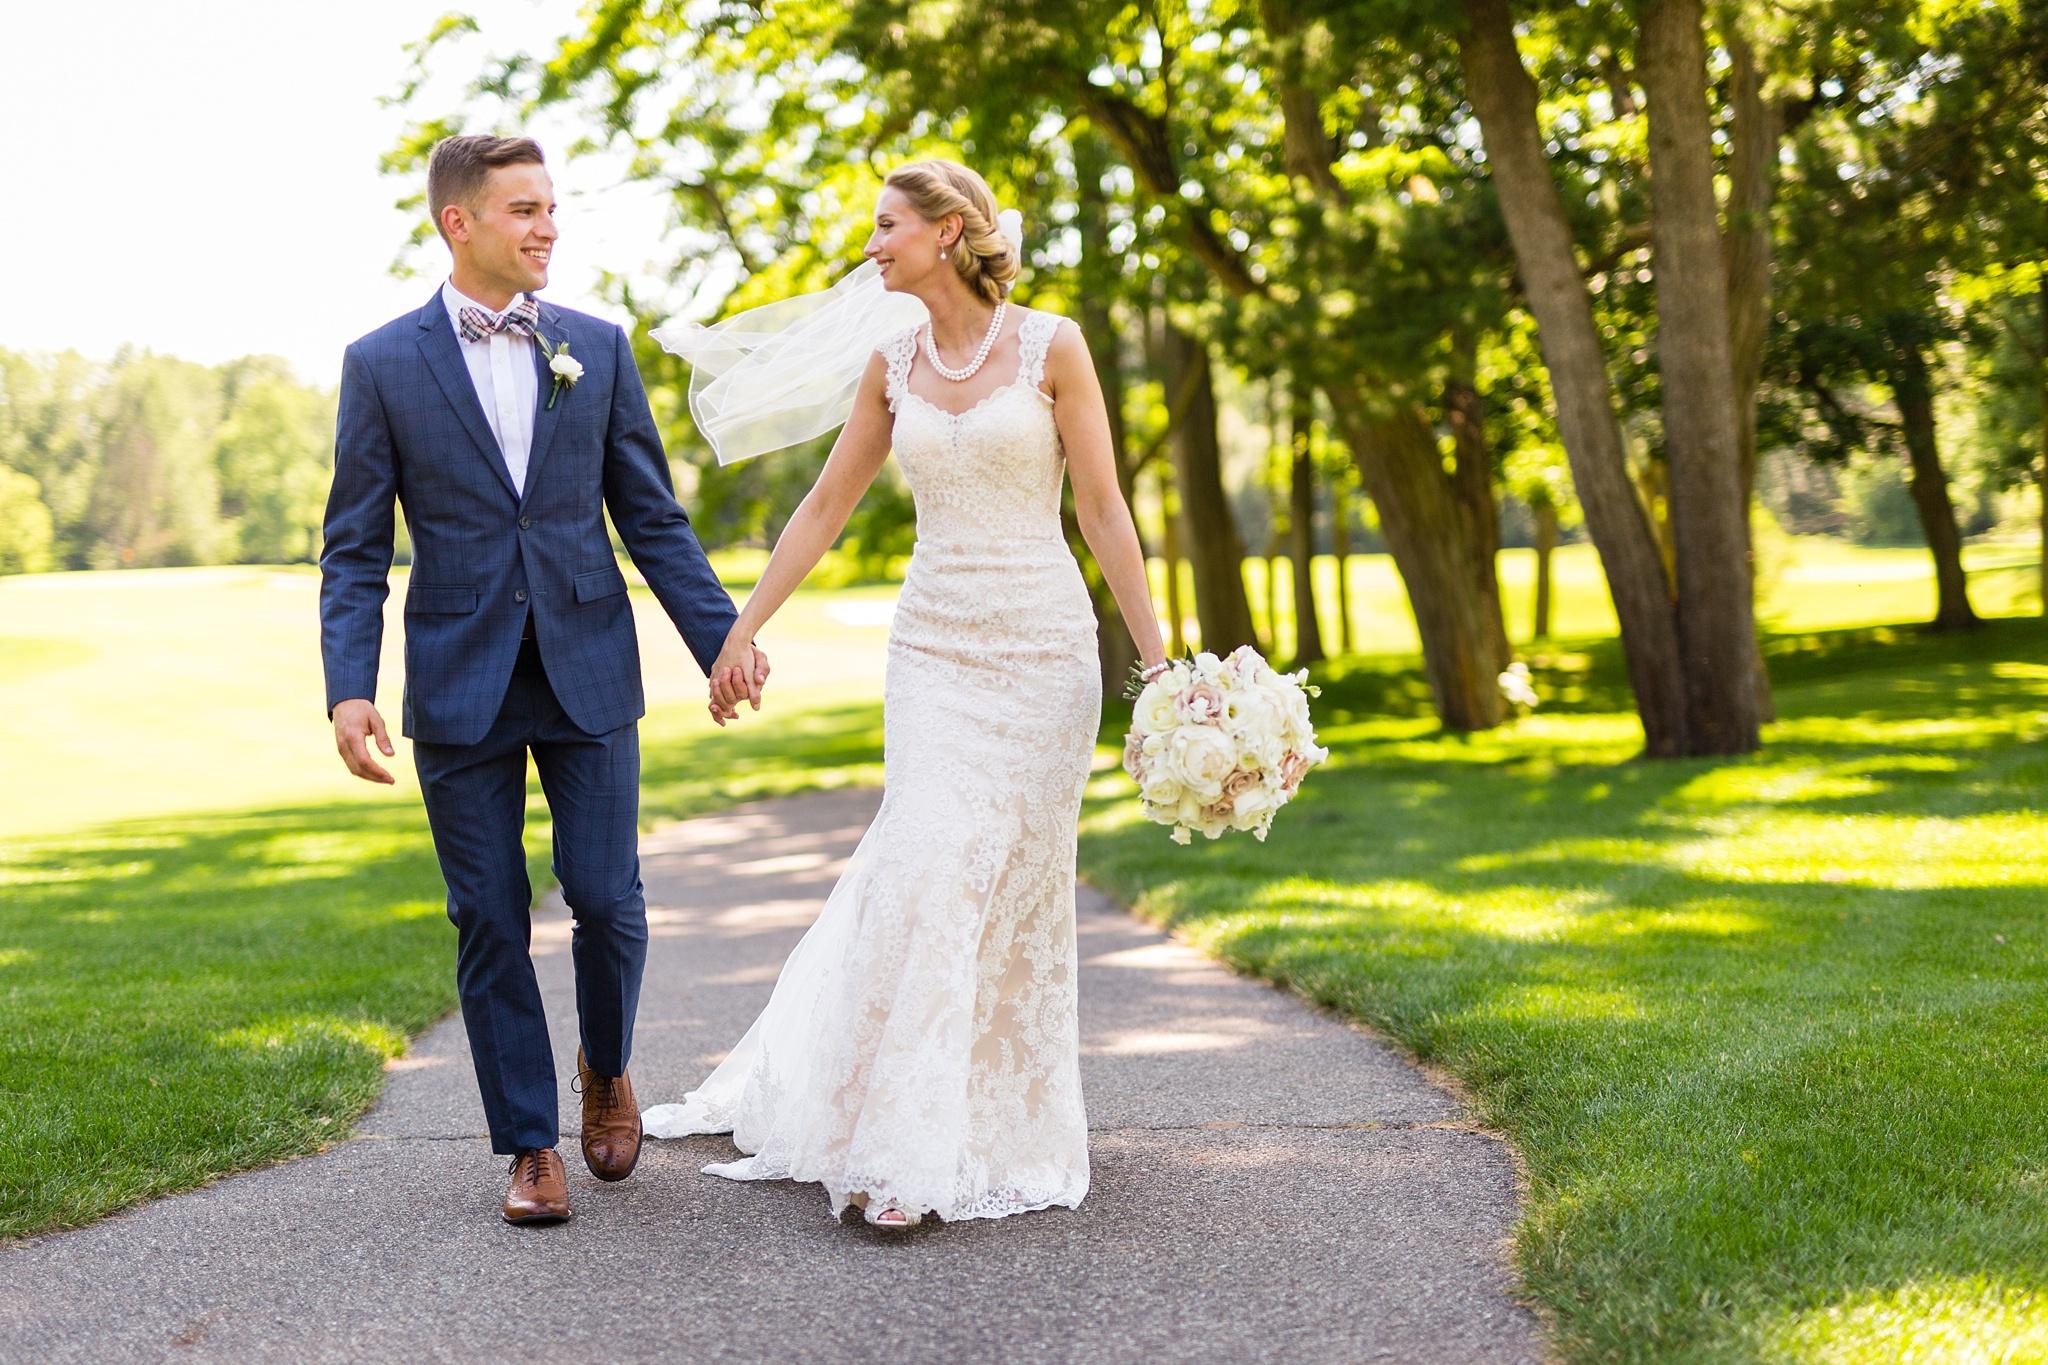 Becky_Cameron_Grand_Rapids_Blythefield Country_Club_Wedding034.JPG